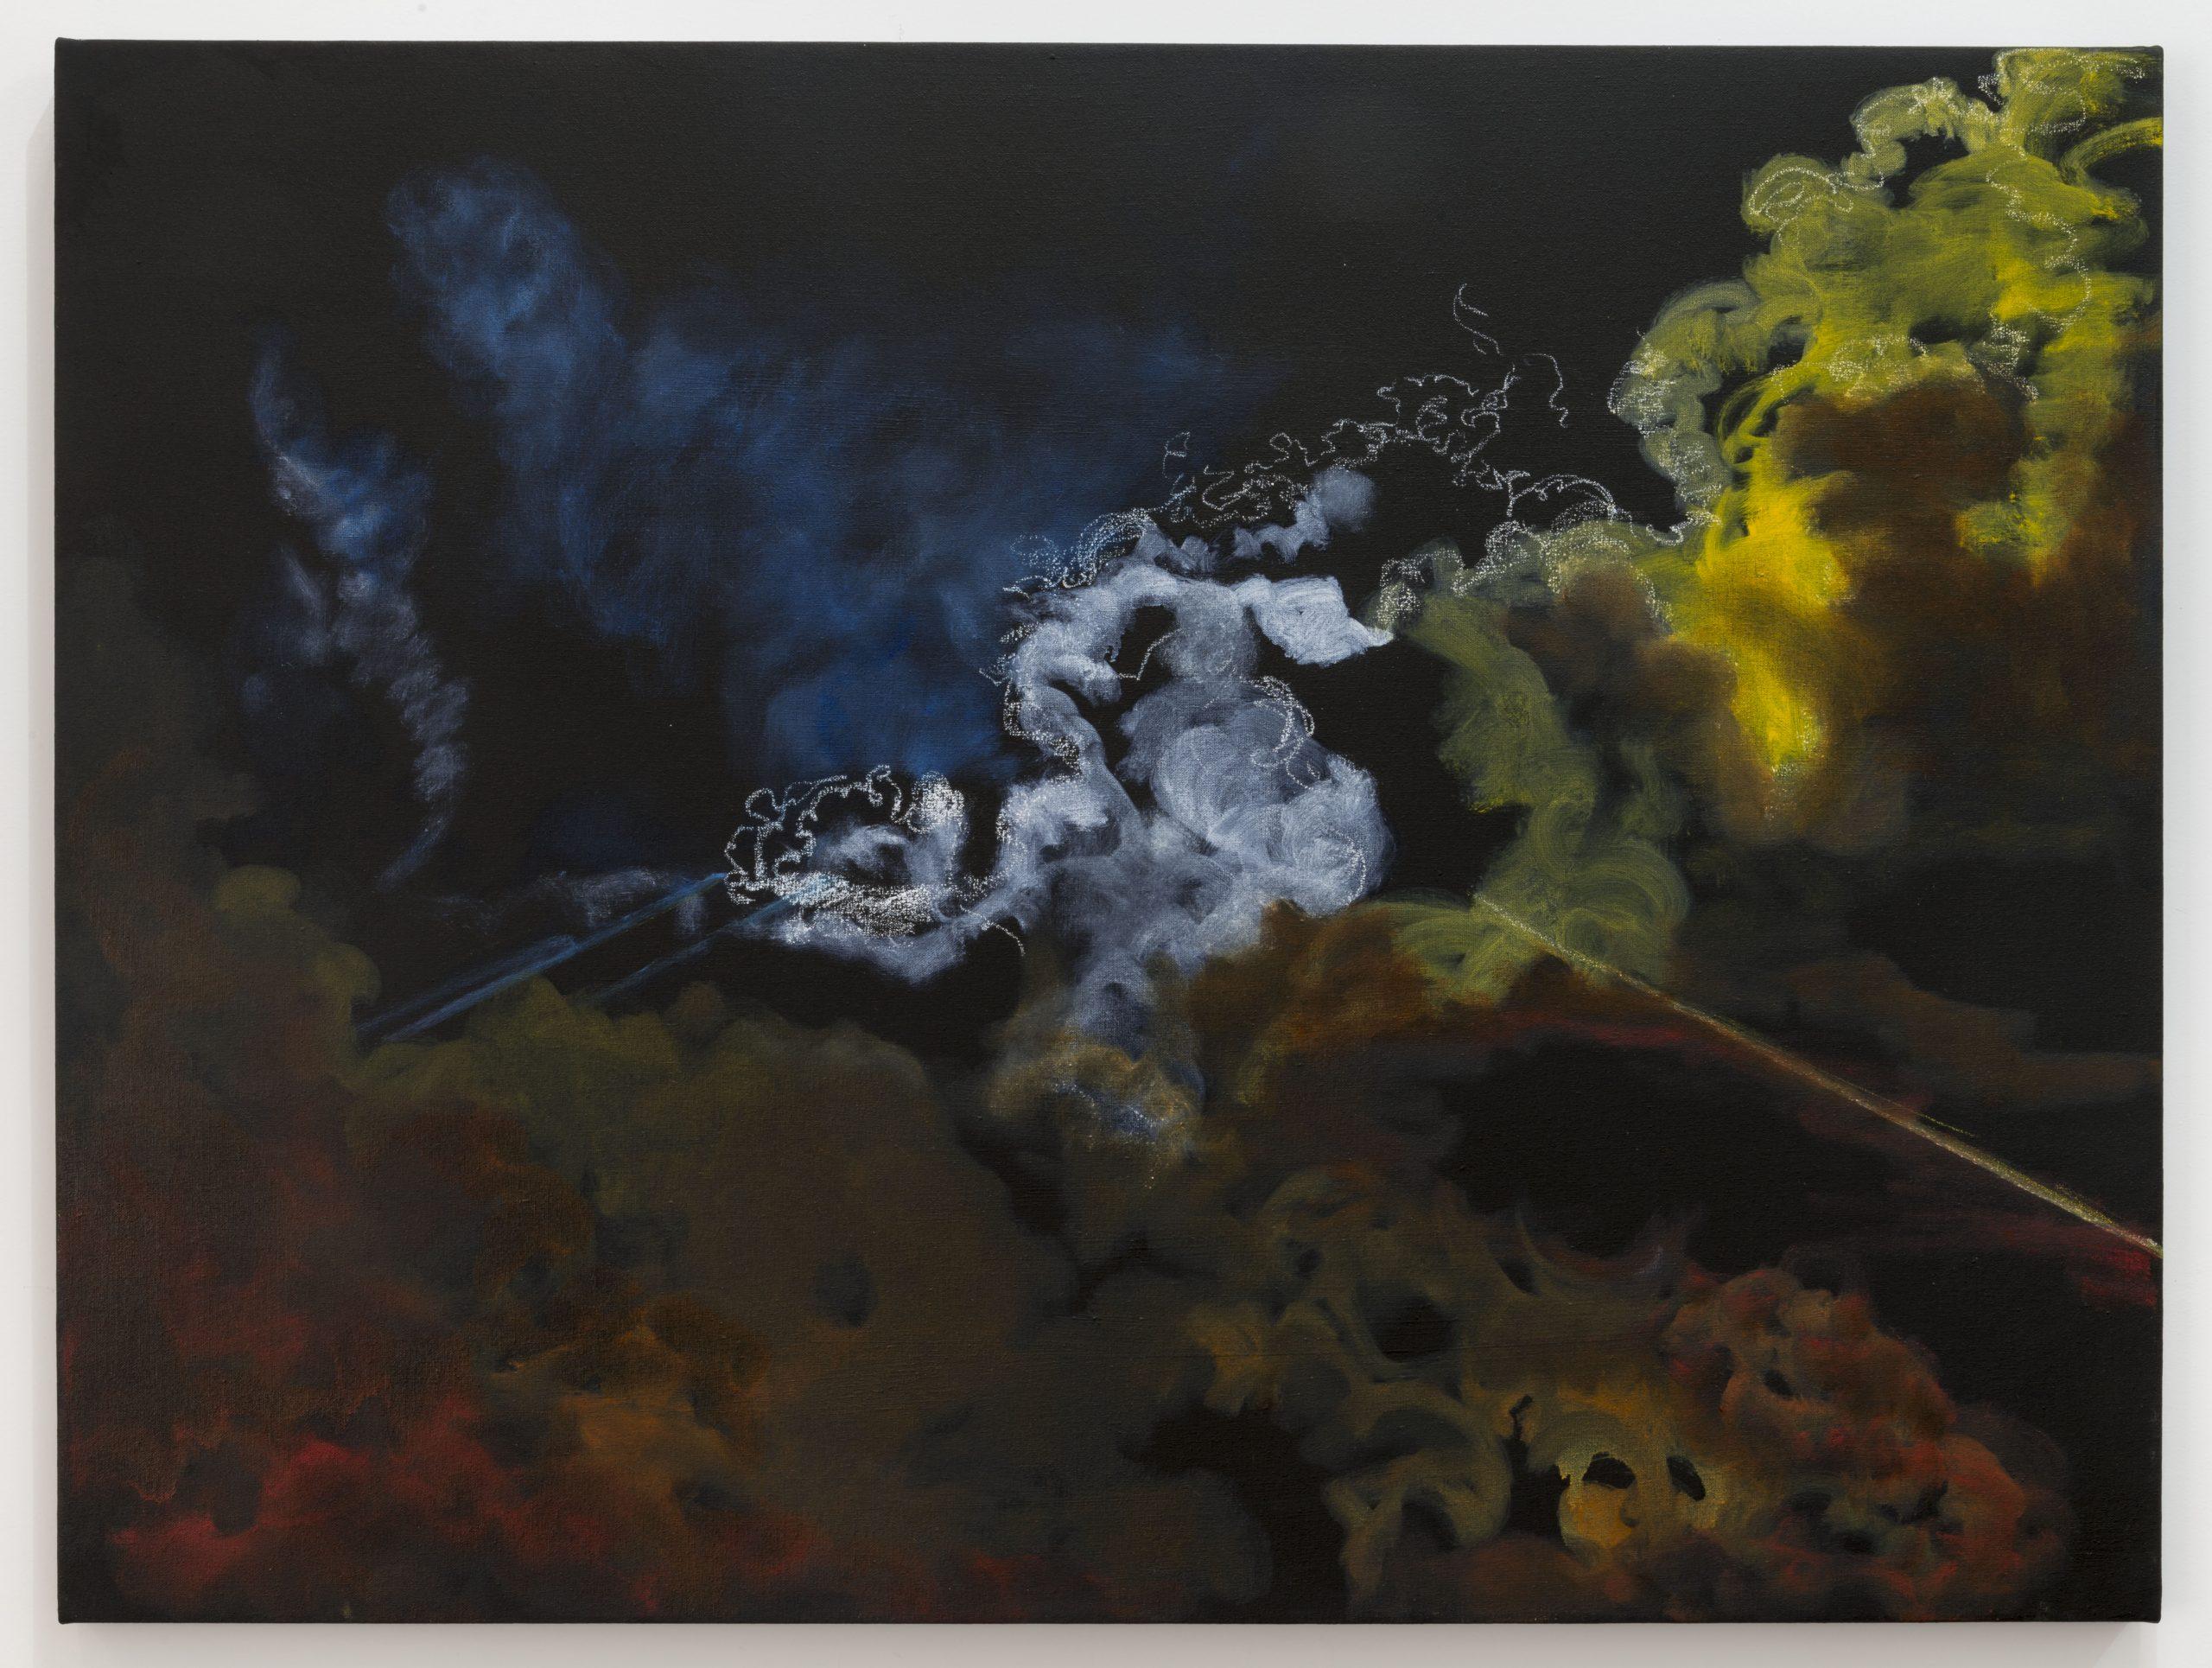 Sandy Rodriguez, Tear Gas No. 5 (Ferguson), 2015. Oil on canvas. 36 x 48 inches. Courtesy of the artist. Photo: Joshua White/JWPictures.com